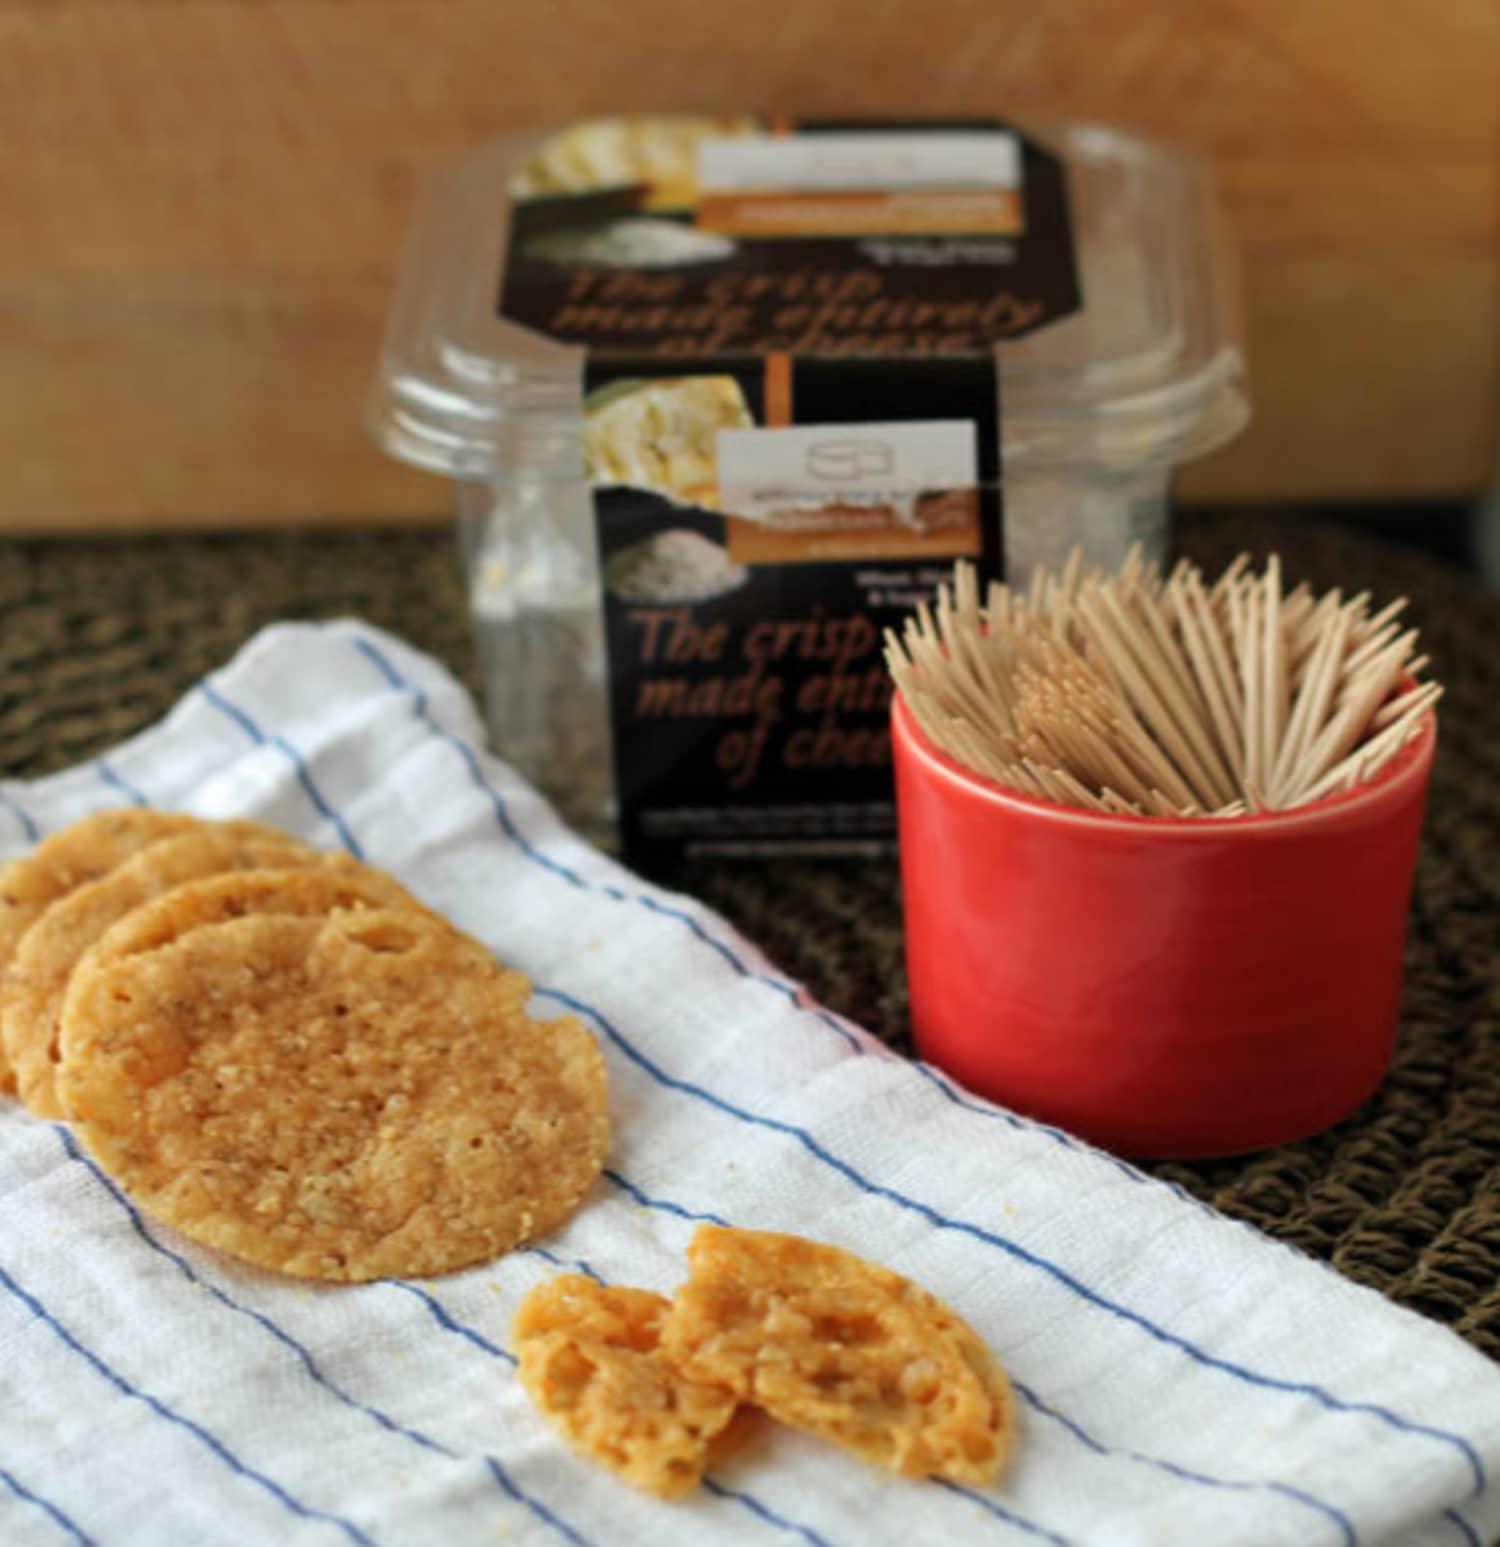 Gluten-Free Snack: Sesame Parmesan Crisps From Kitchen